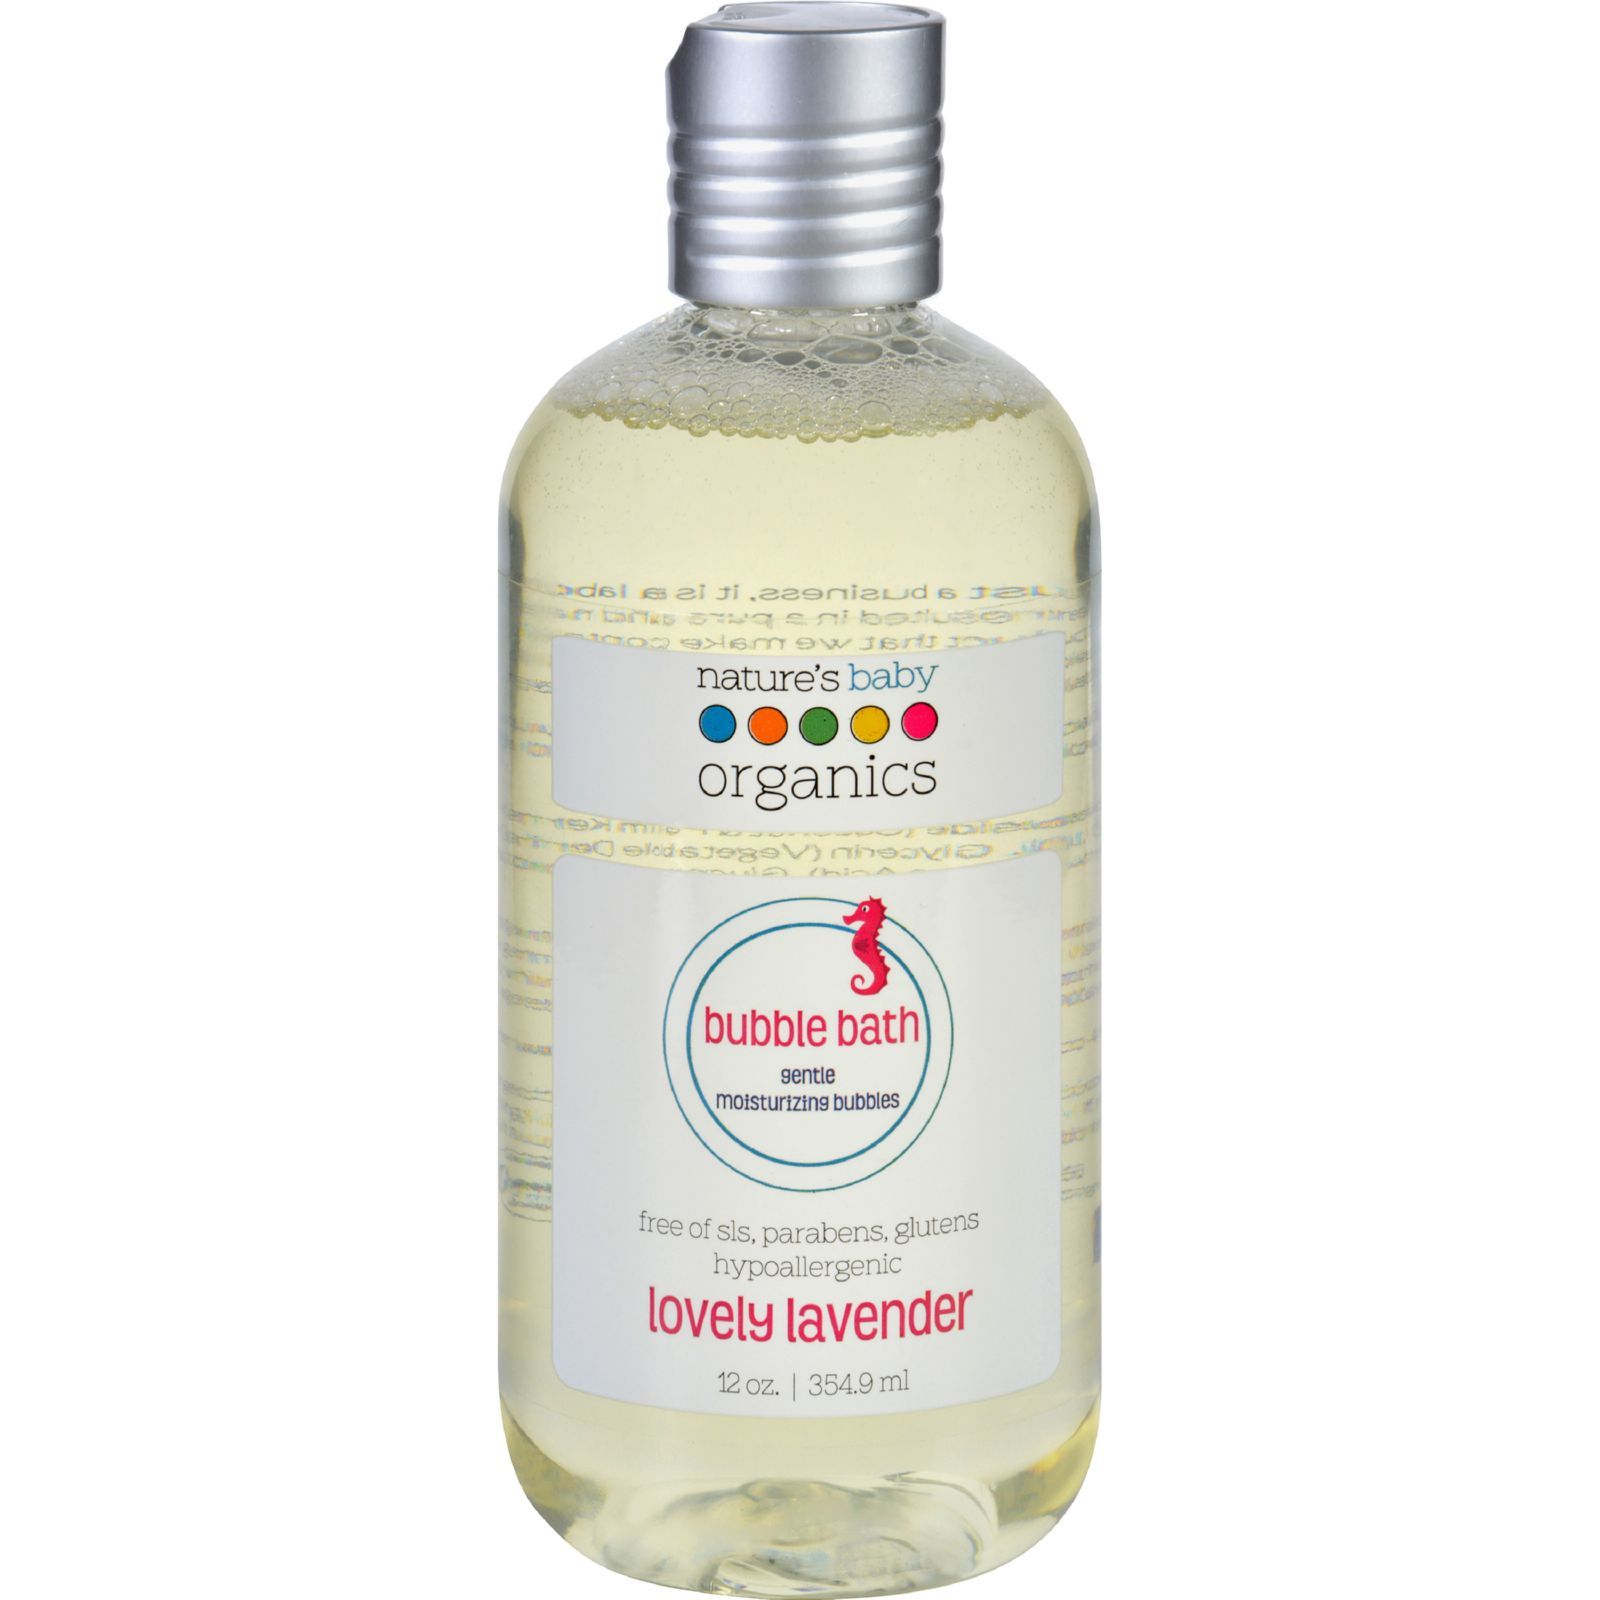 Nature's Baby Organics Bubble Bath - Moisturizing - Lovely Lavender - 12 oz